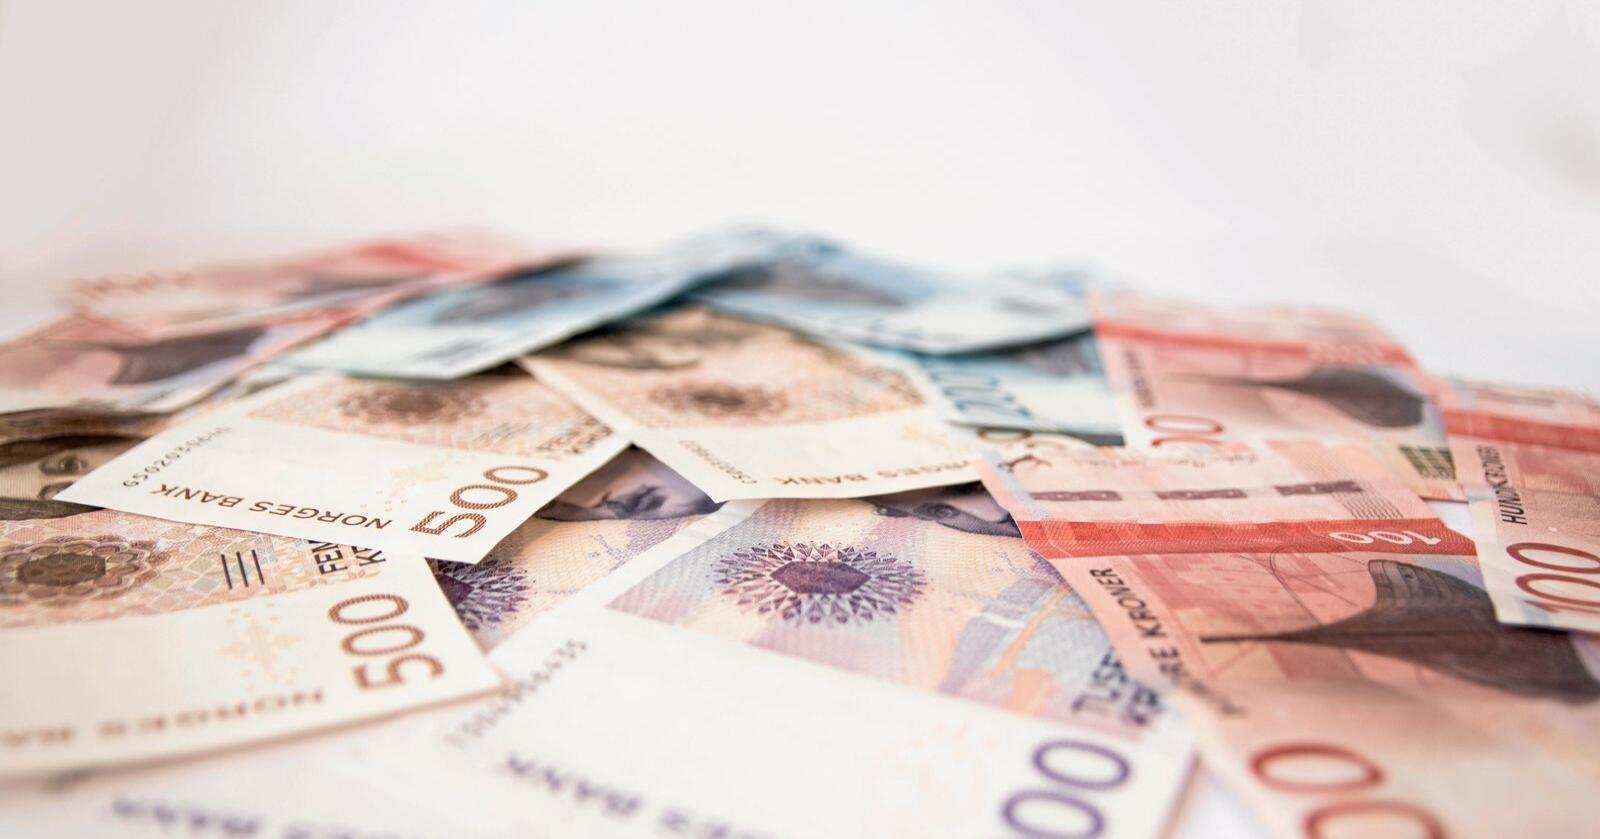 Akershus Senterparti frykter regjeringen vil bruke den svake kommuneøkonomien som en unnskyldning for en ny runde med kommunesammenslåinger. Foto: Mostphotos